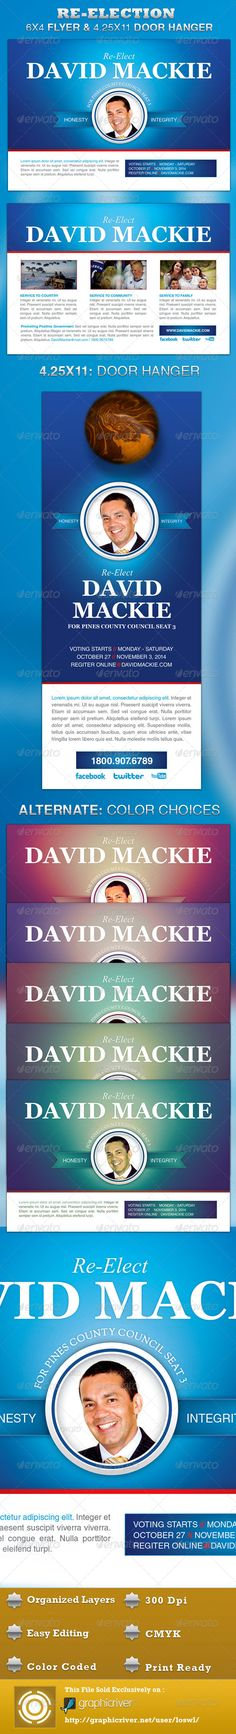 campaign brochure template - political campaign brochure designs political campaign